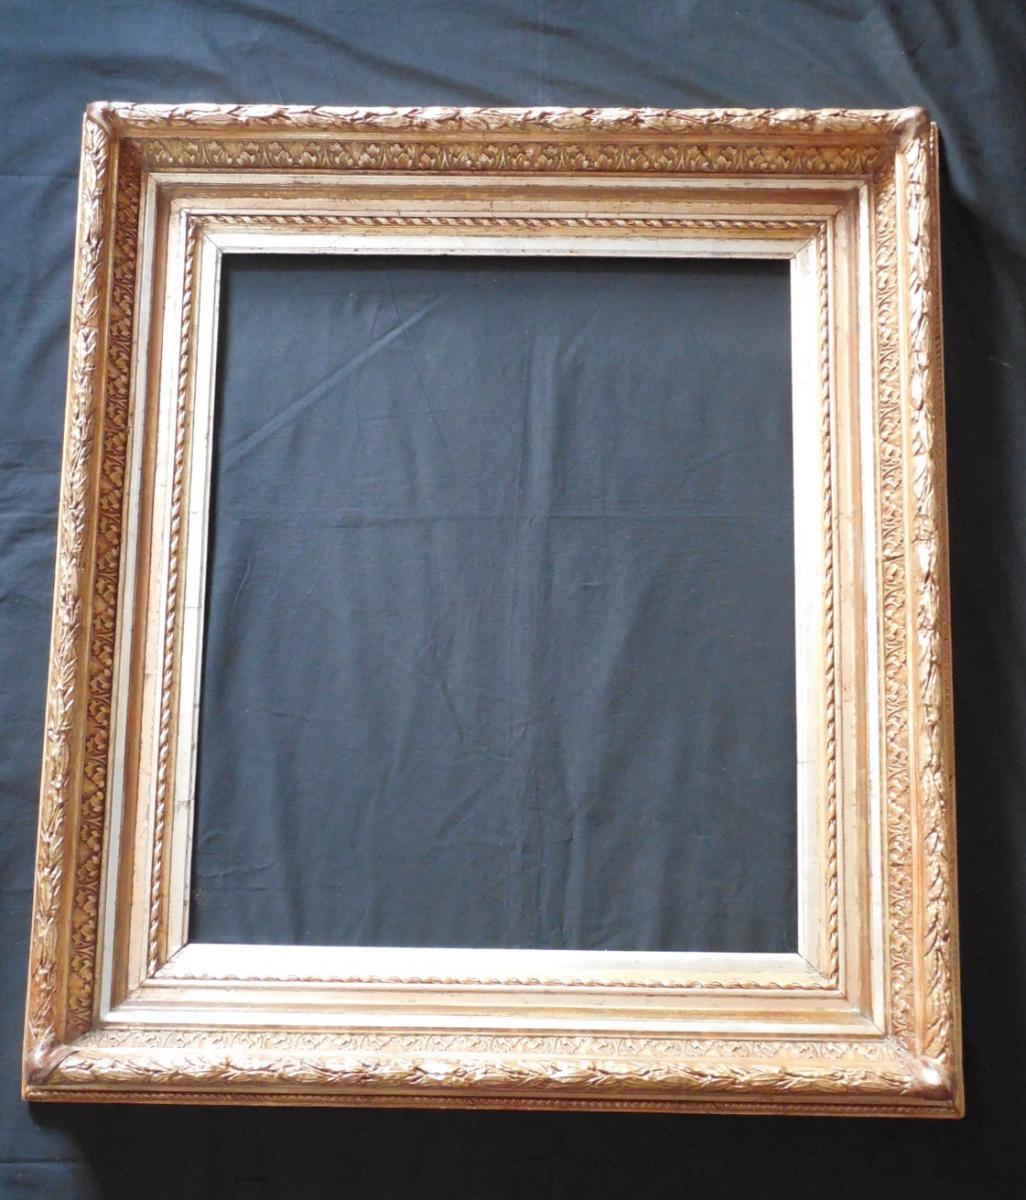 Stucco On Frame : Frame wood and stucco gold silver nineteenth old frames